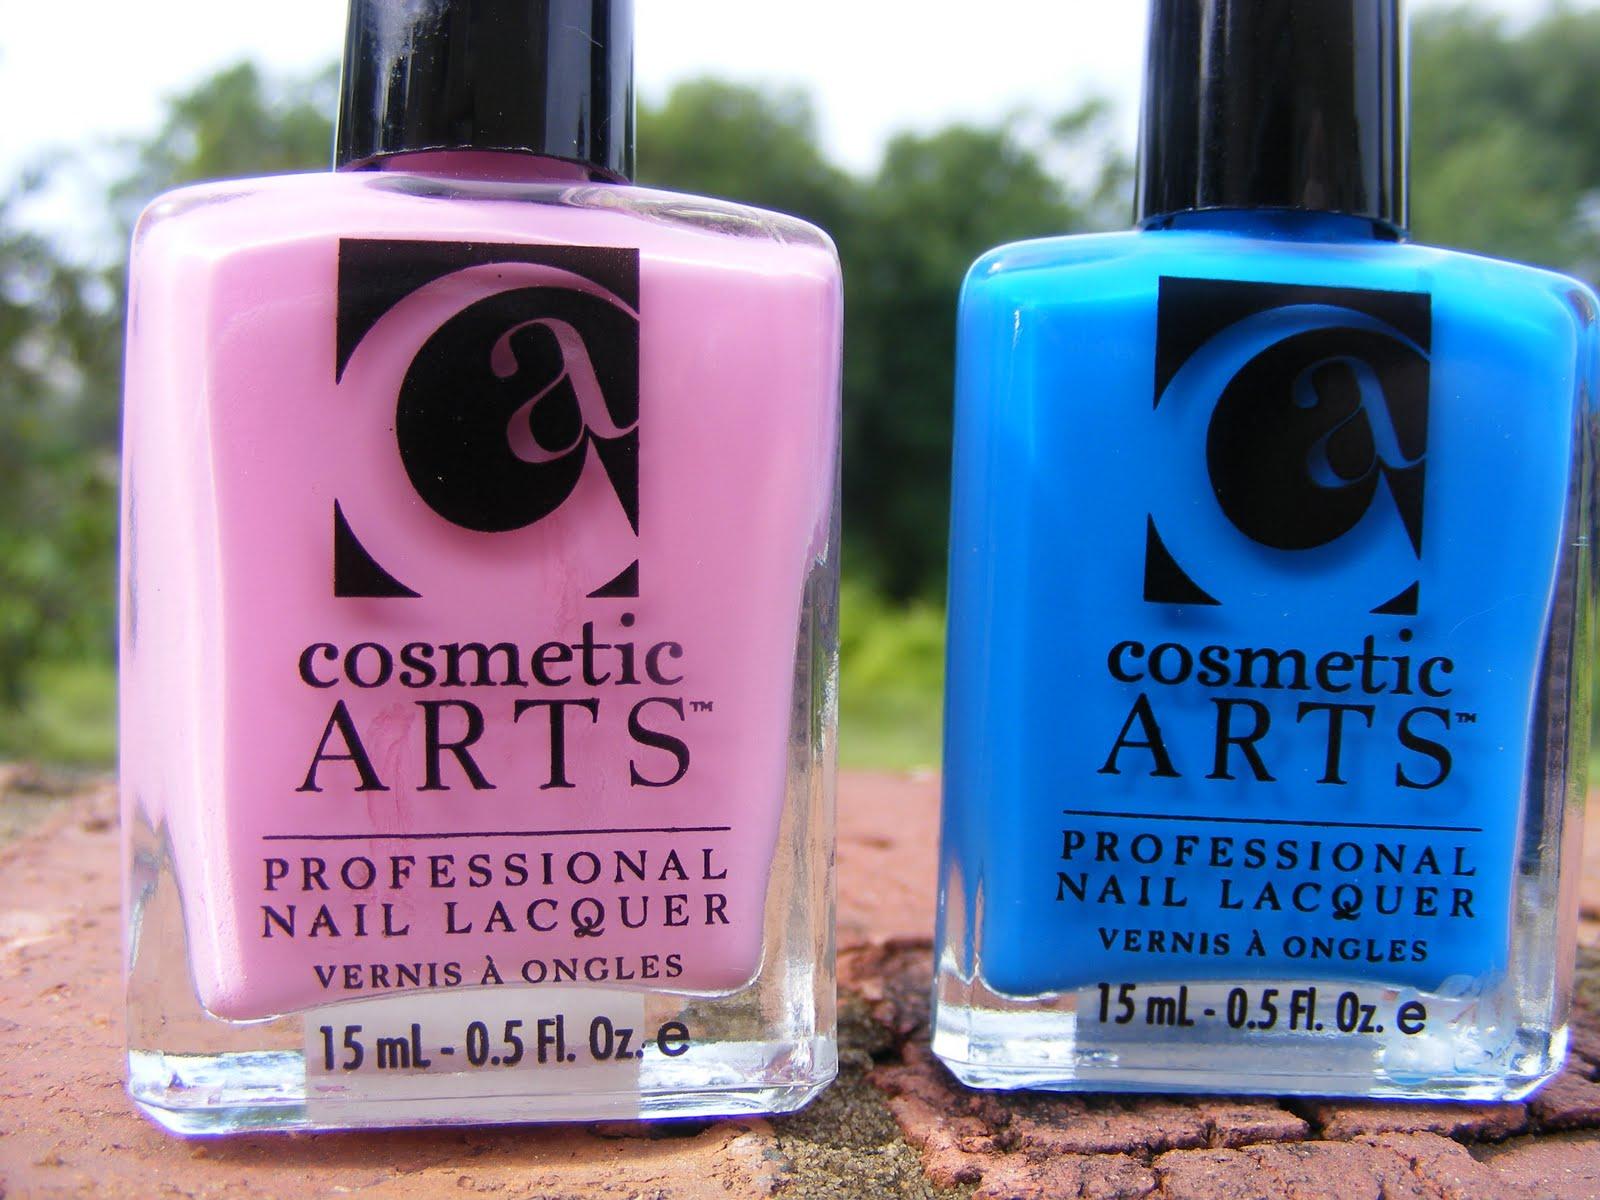 http://1.bp.blogspot.com/-oXQaNO0X-bA/TgXtqSIQznI/AAAAAAAACtI/U9ebri8cN_s/s1600/pink+and+blue+003.JPG